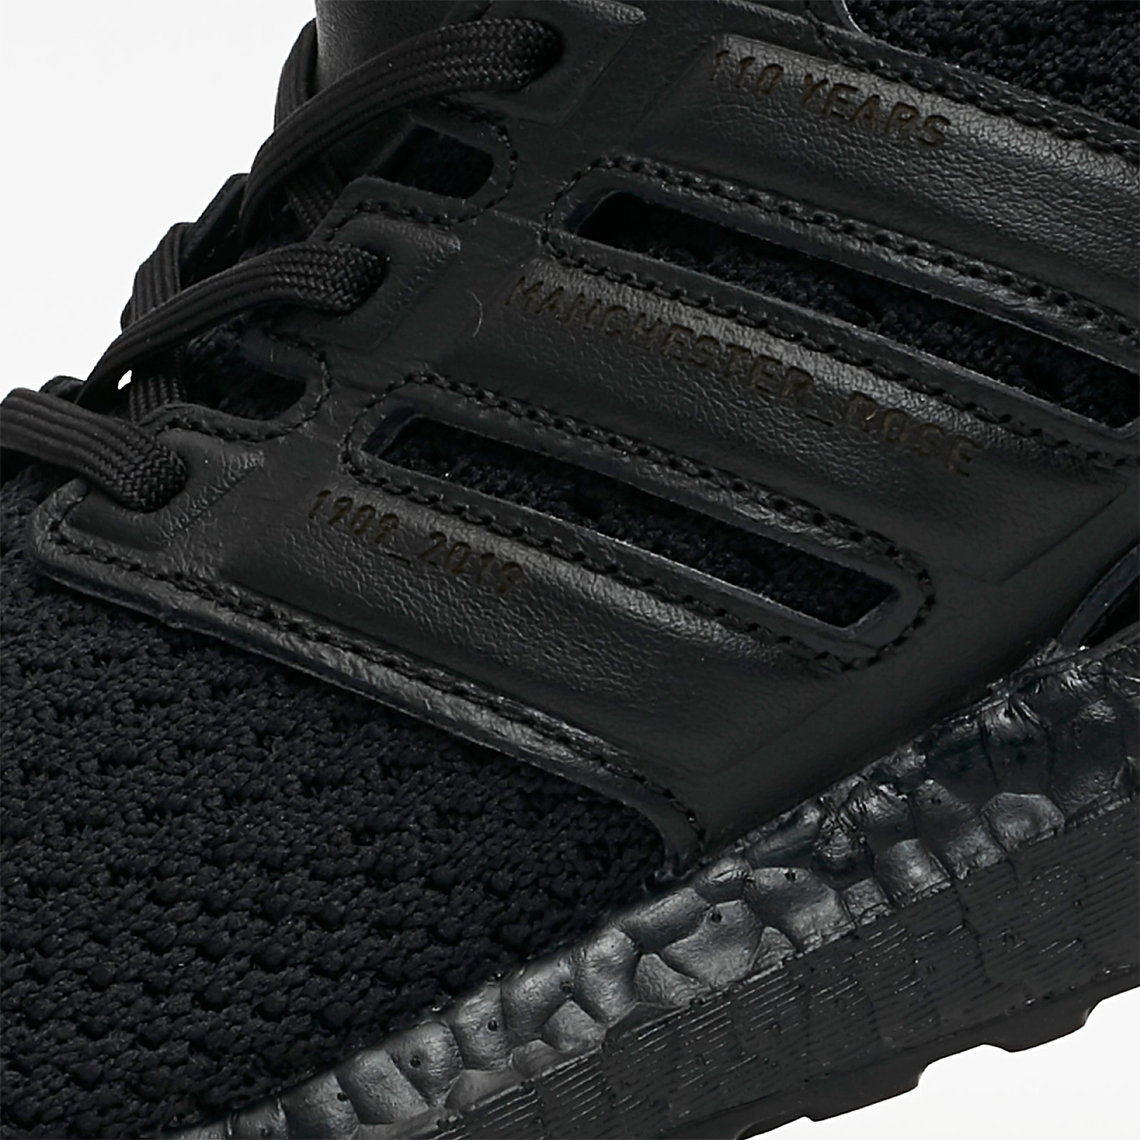 Adidas Ultra Boost Manchester Rose Eg8088 Release Date Sneakernews Com